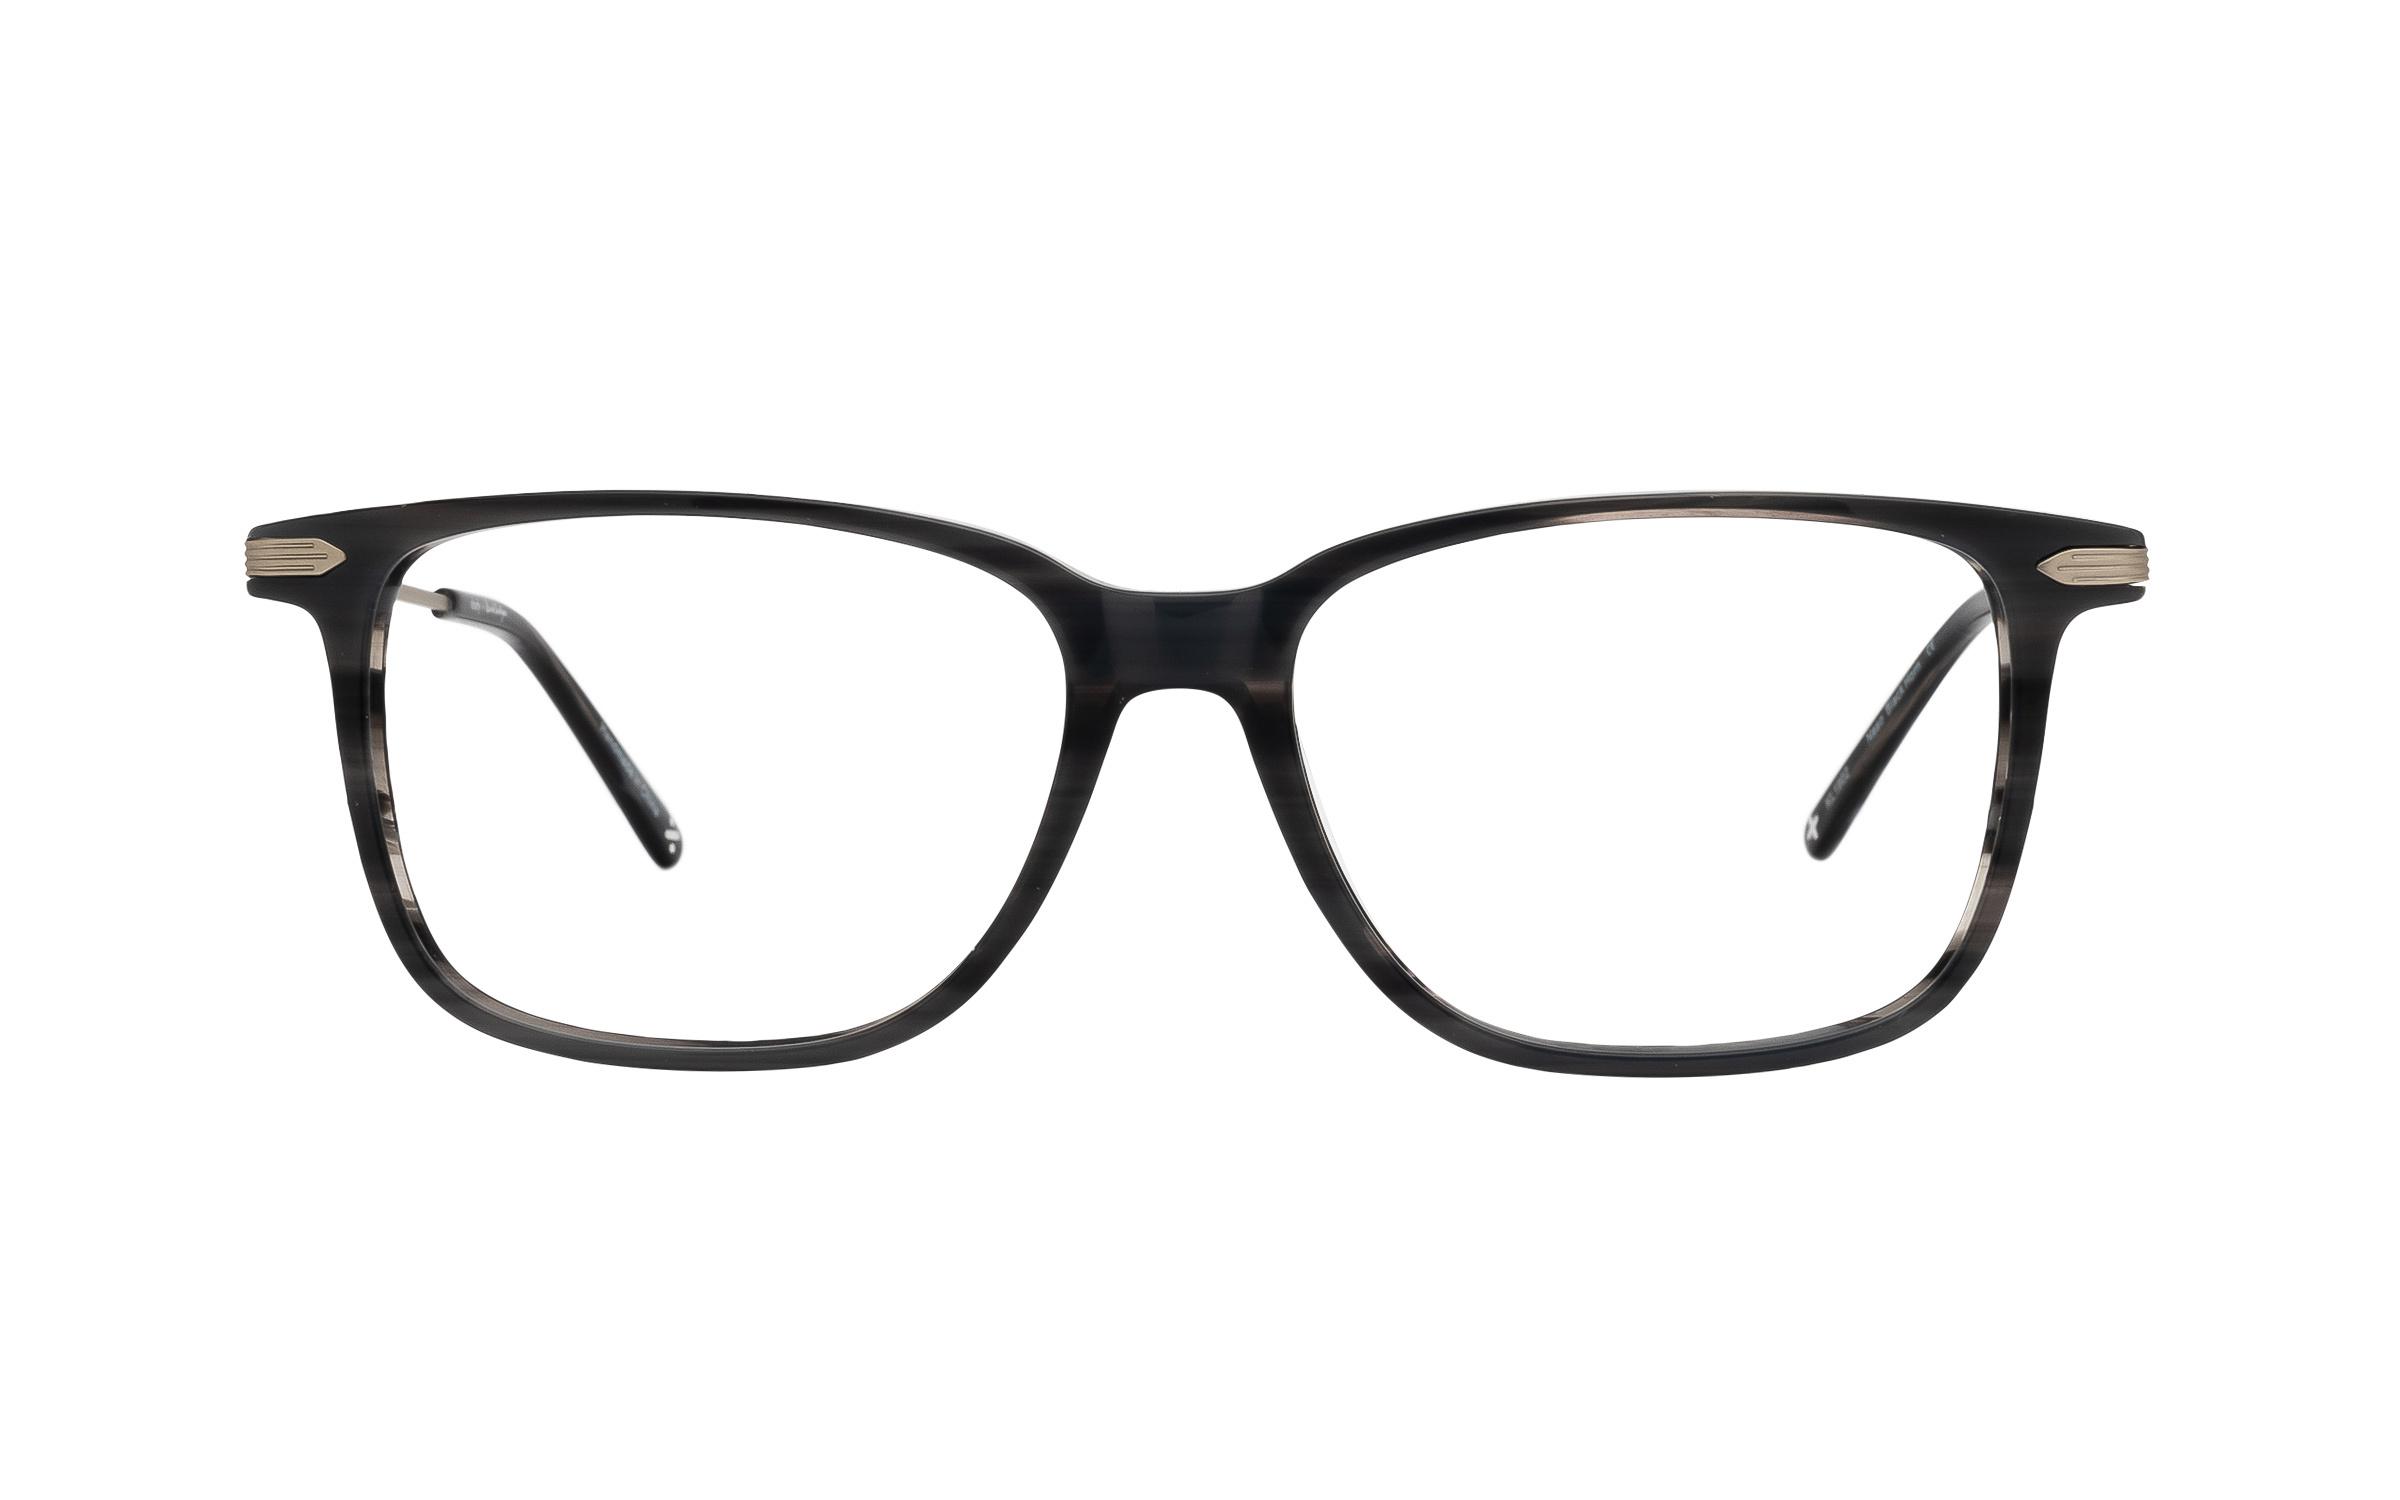 http://www.coastal.com/ - Derek Cardigan Neso (54) Eyeglasses and Frame in Horn Black | Acetate/Metal – Online Coastal